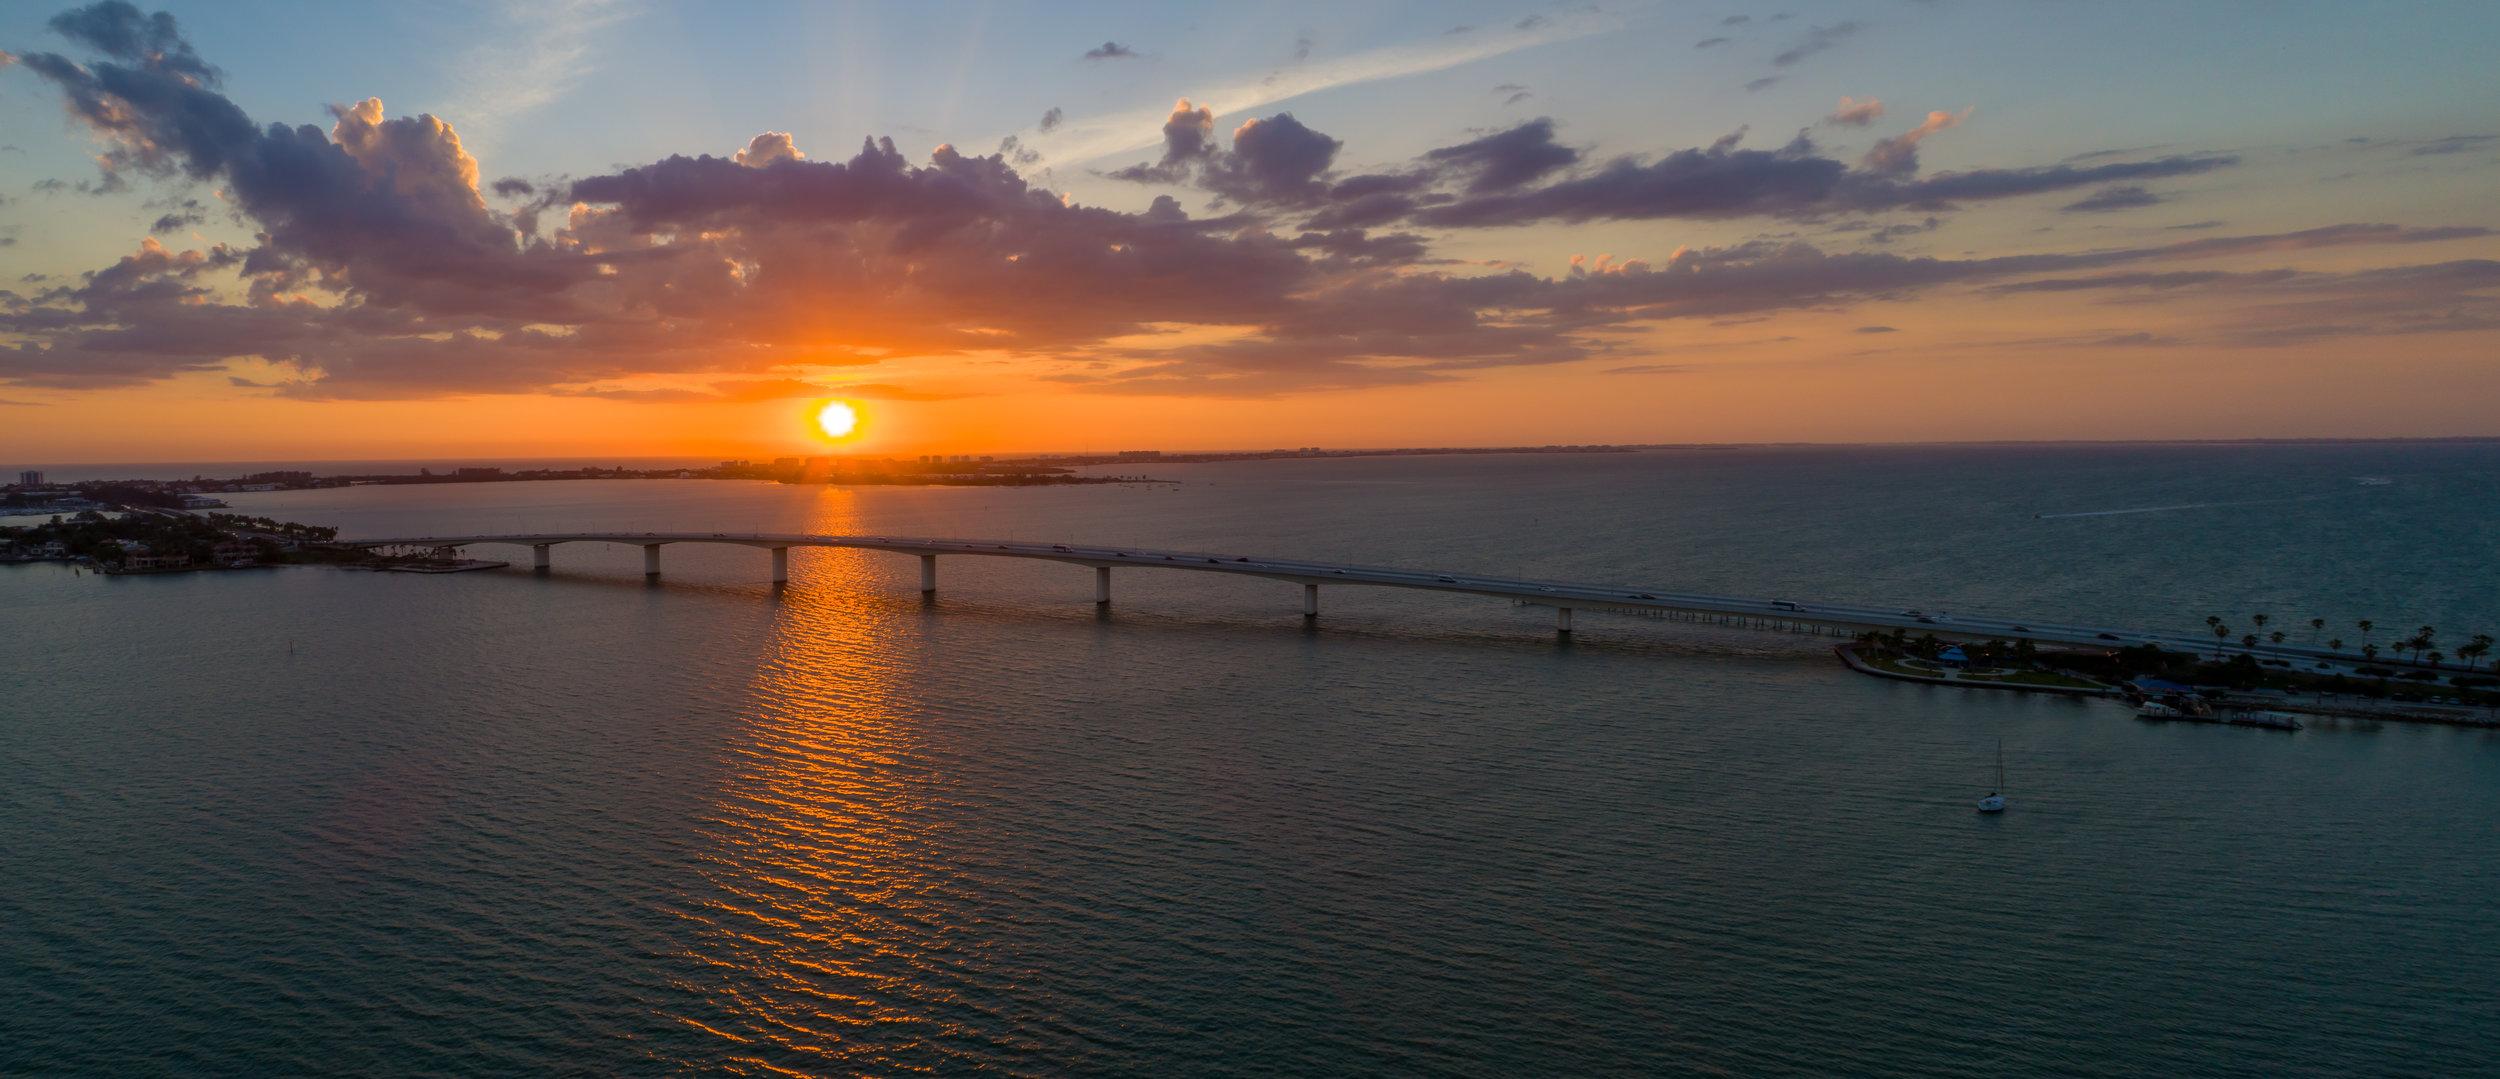 Sarasota Sunset-1.jpg